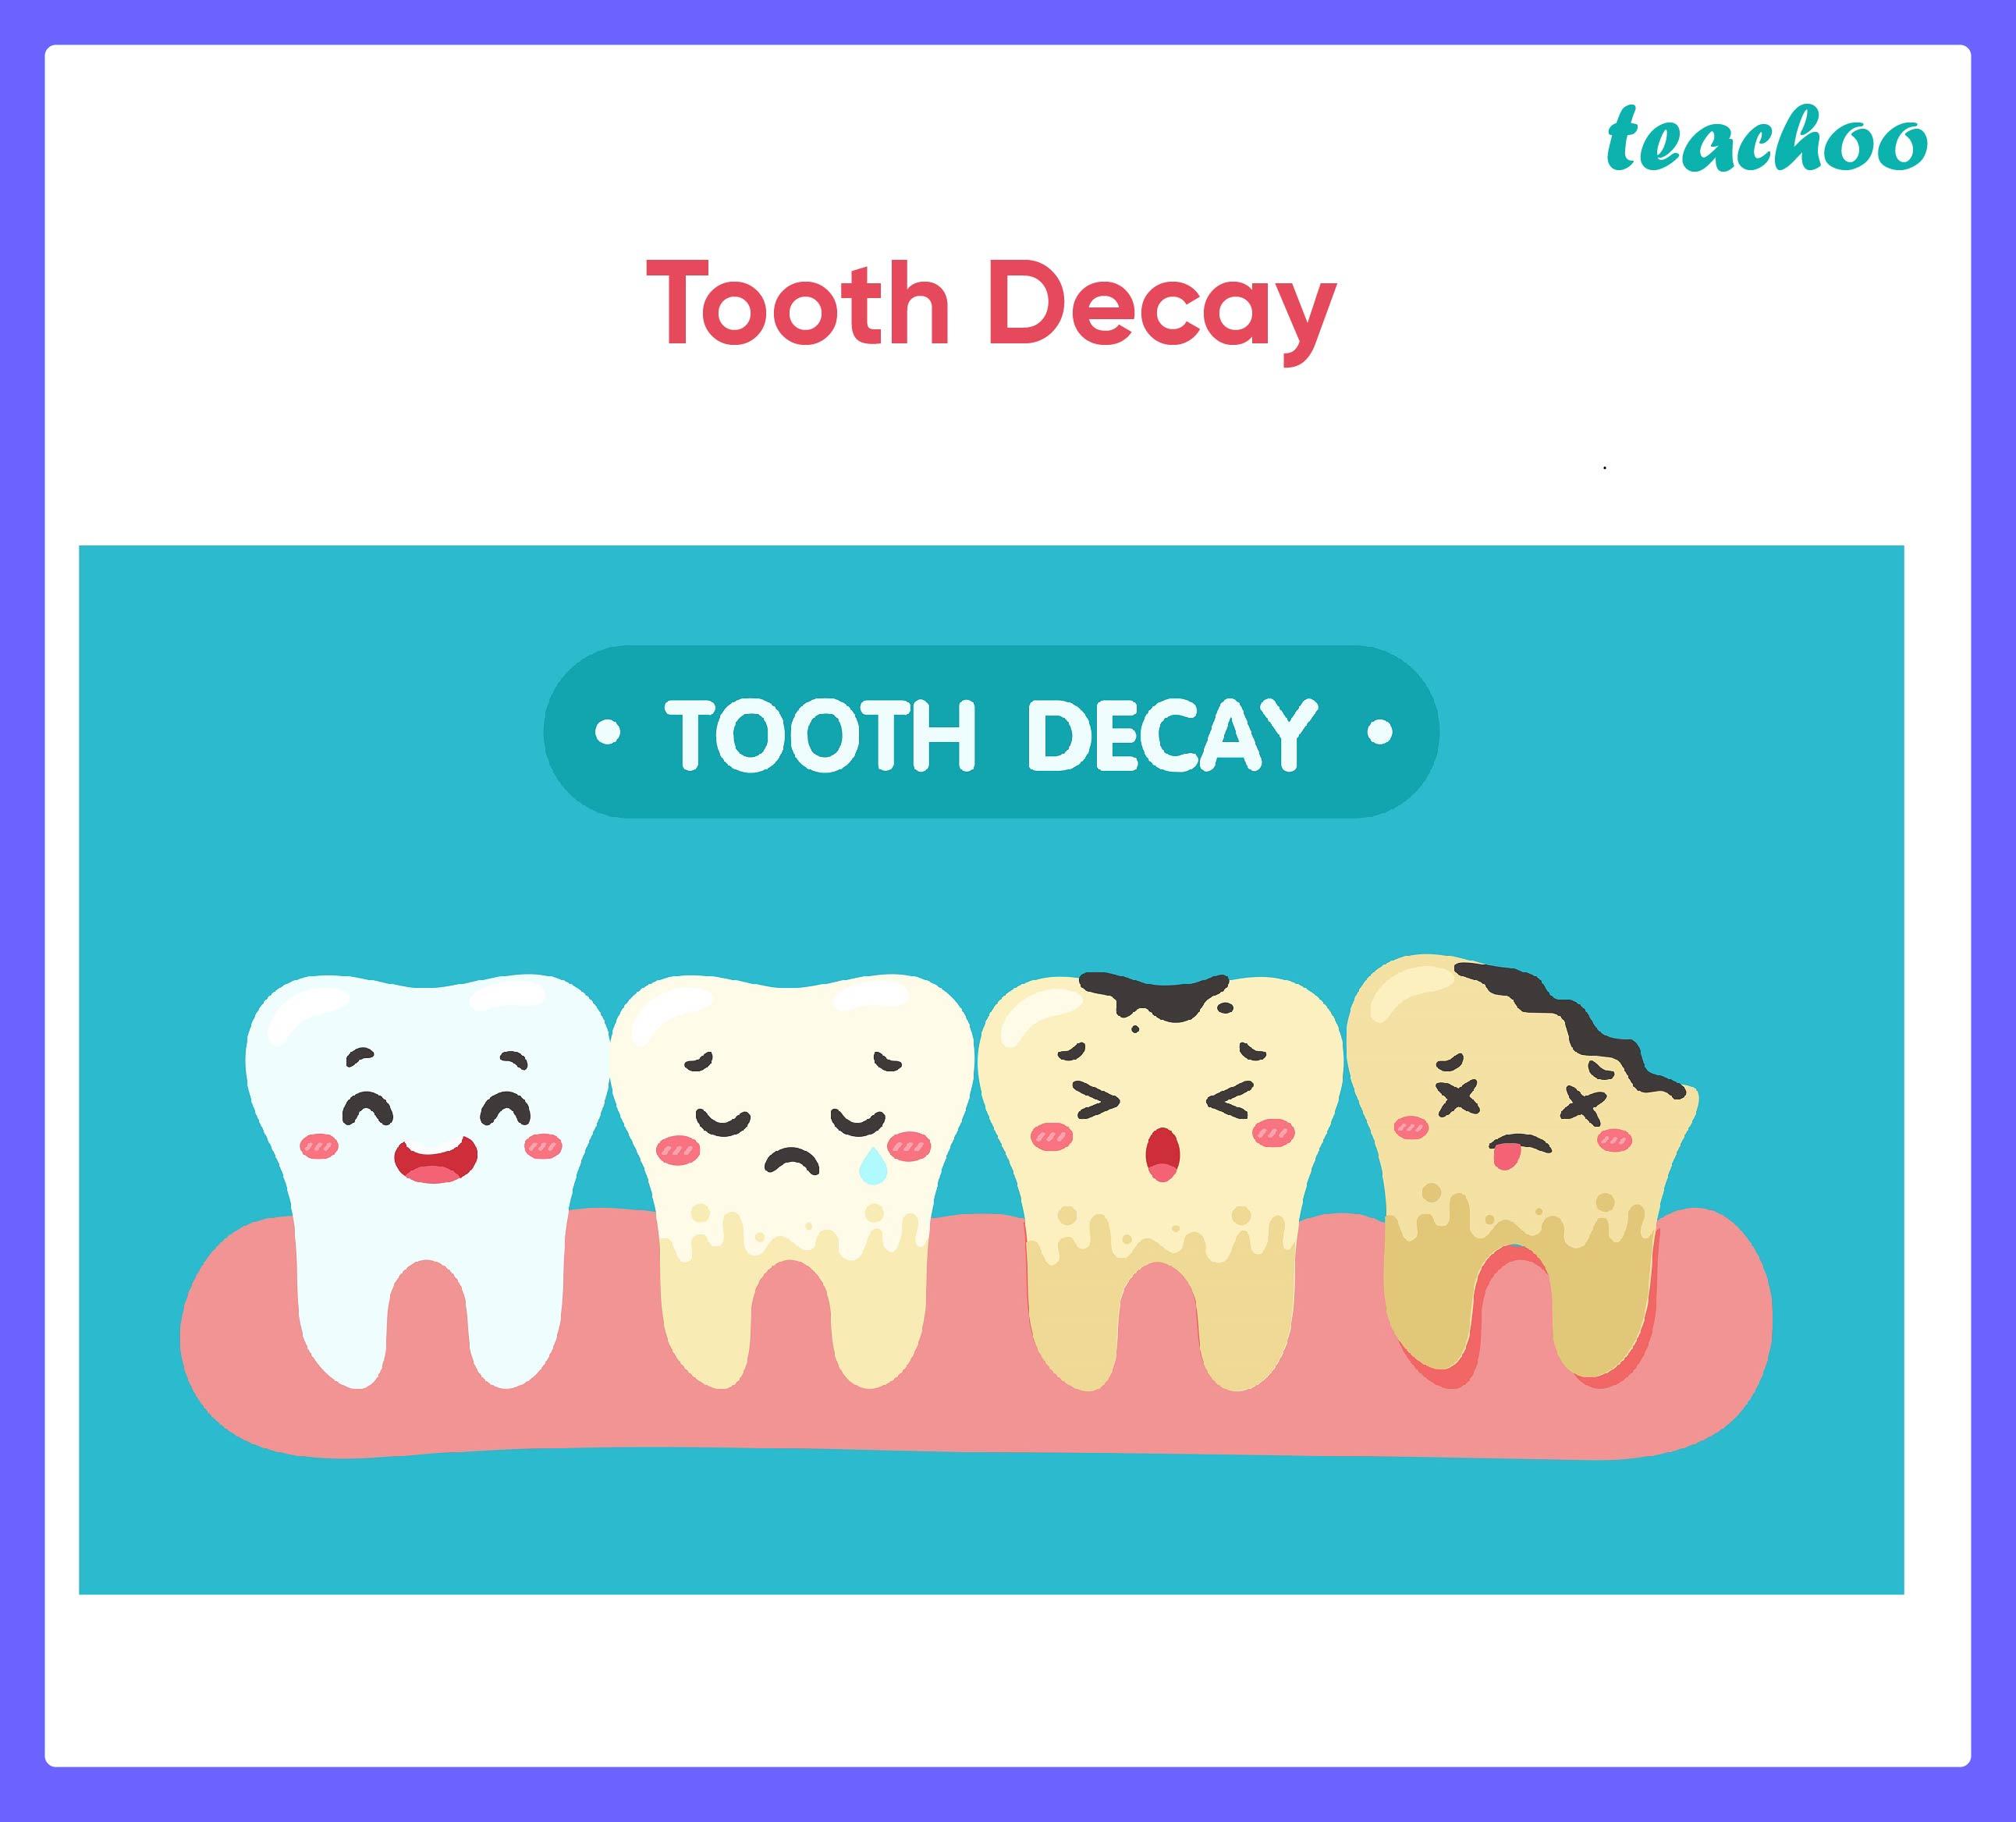 Tooth Decay - Teachoo.jpg